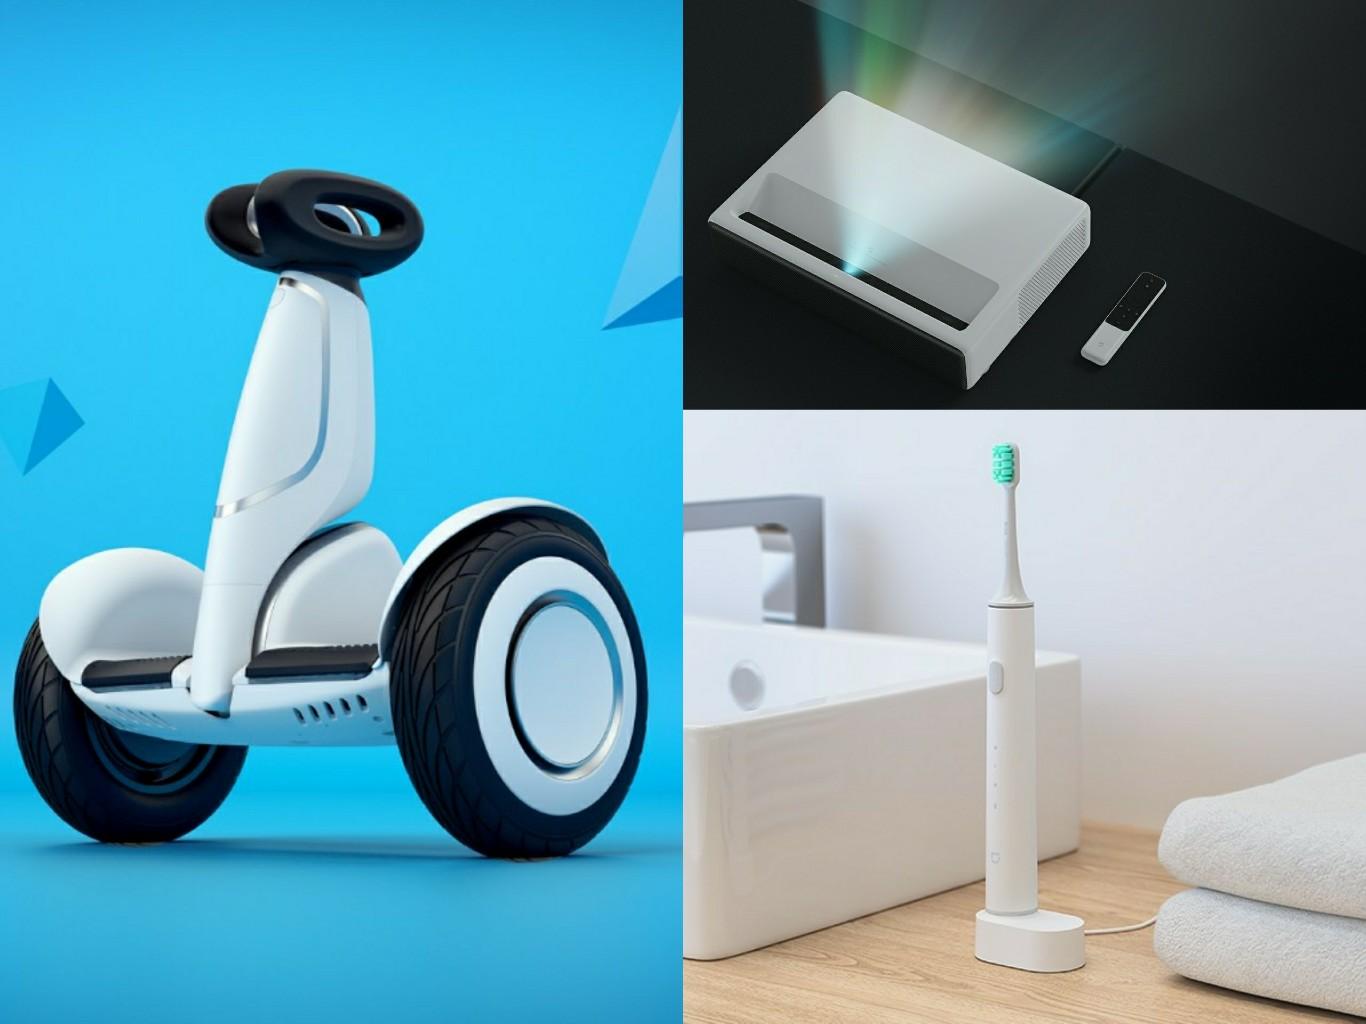 Xiaomi-Ninebot-Plus-Mi-Laser-Projector-Mi-Ultrasonic-Toothbrush